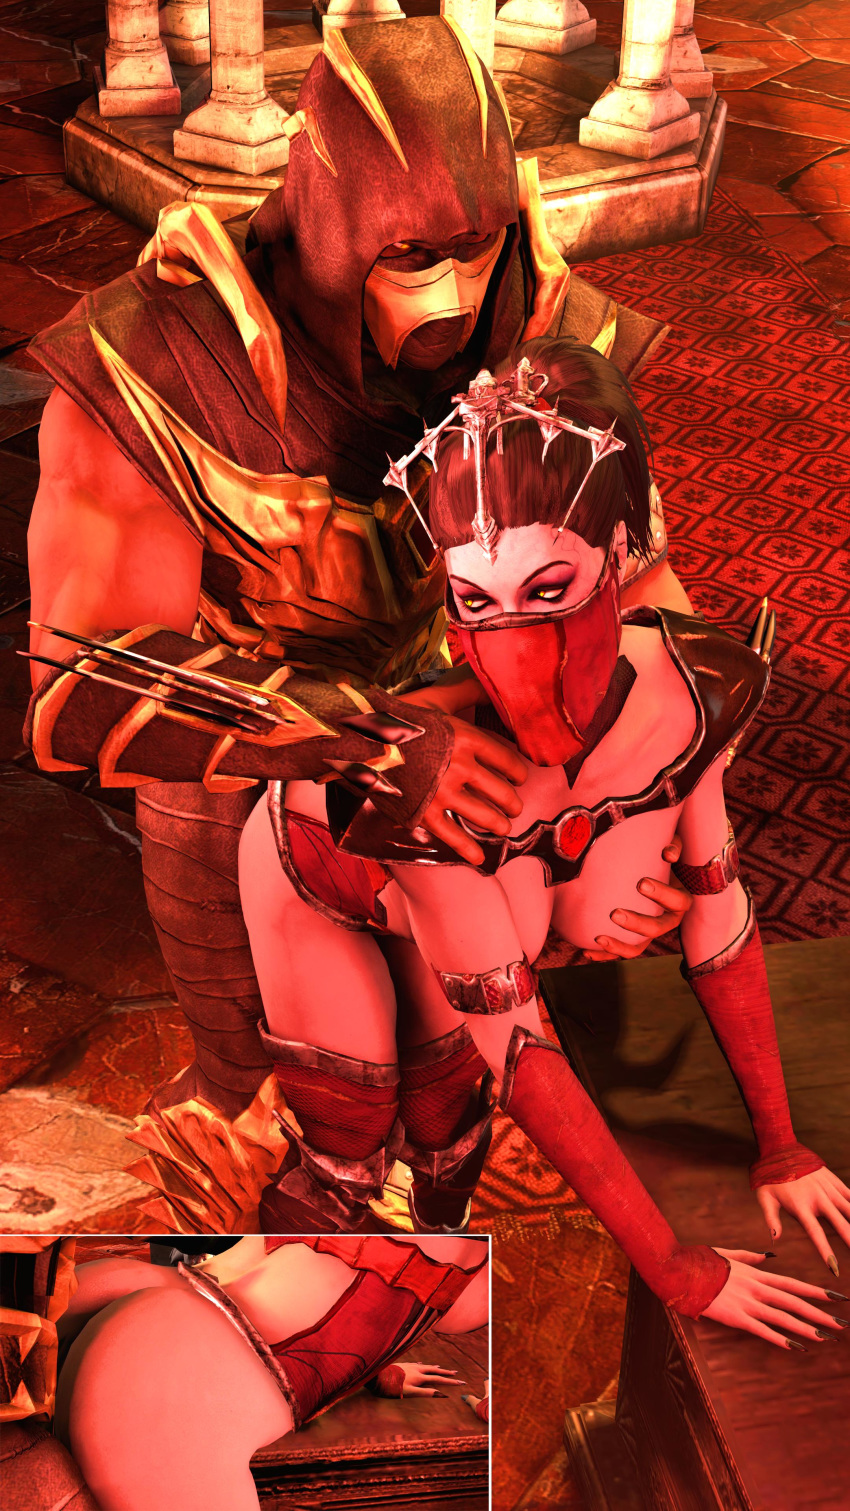 mortal and kitana kombat mileena King of fighters mai shiranui